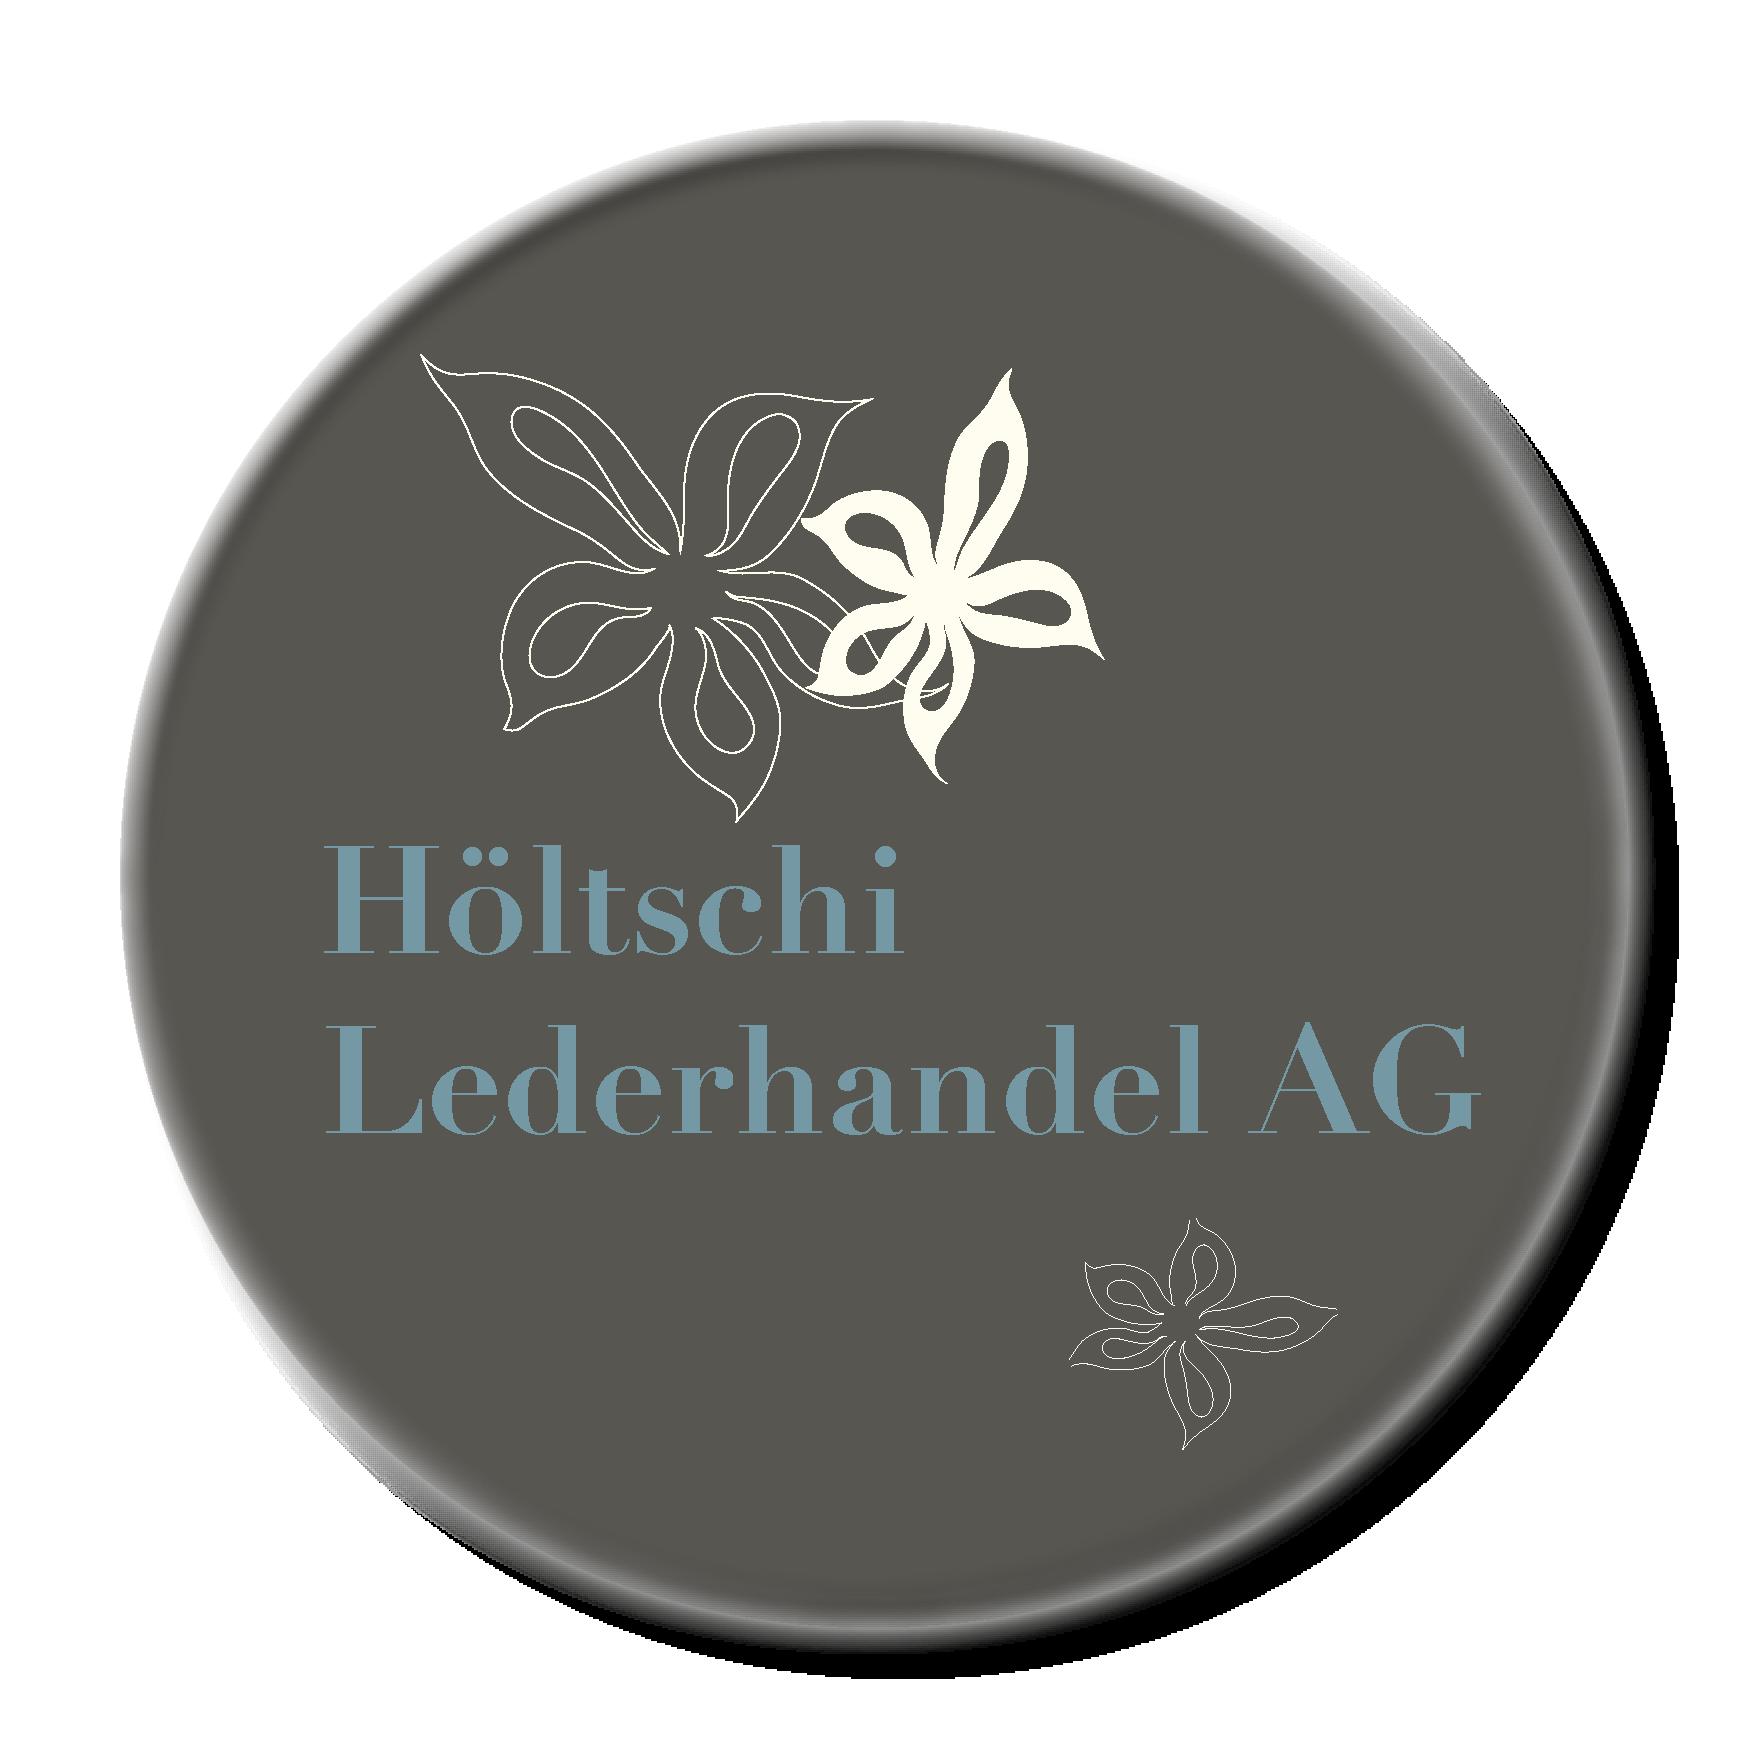 Hoeltschi-Lederhandel AG Leder